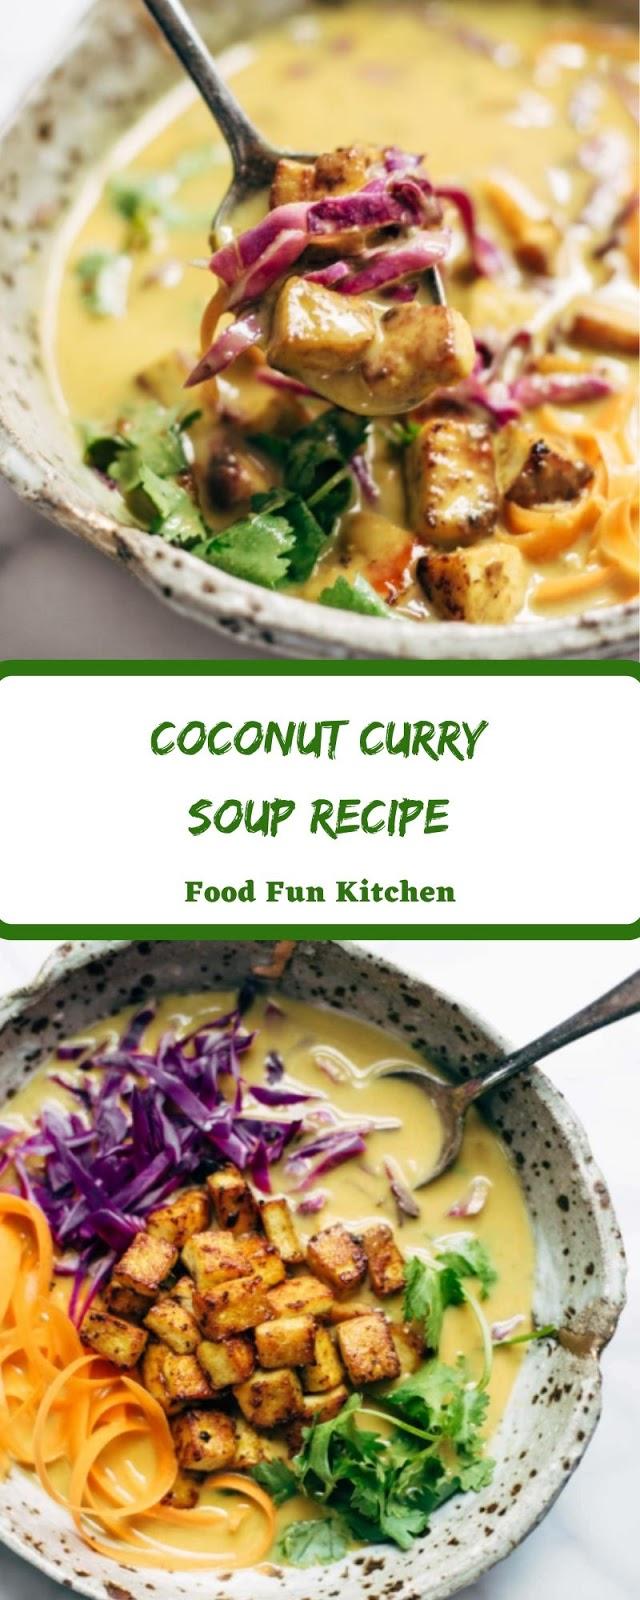 COCONUT CURRY SOUP RECIPE